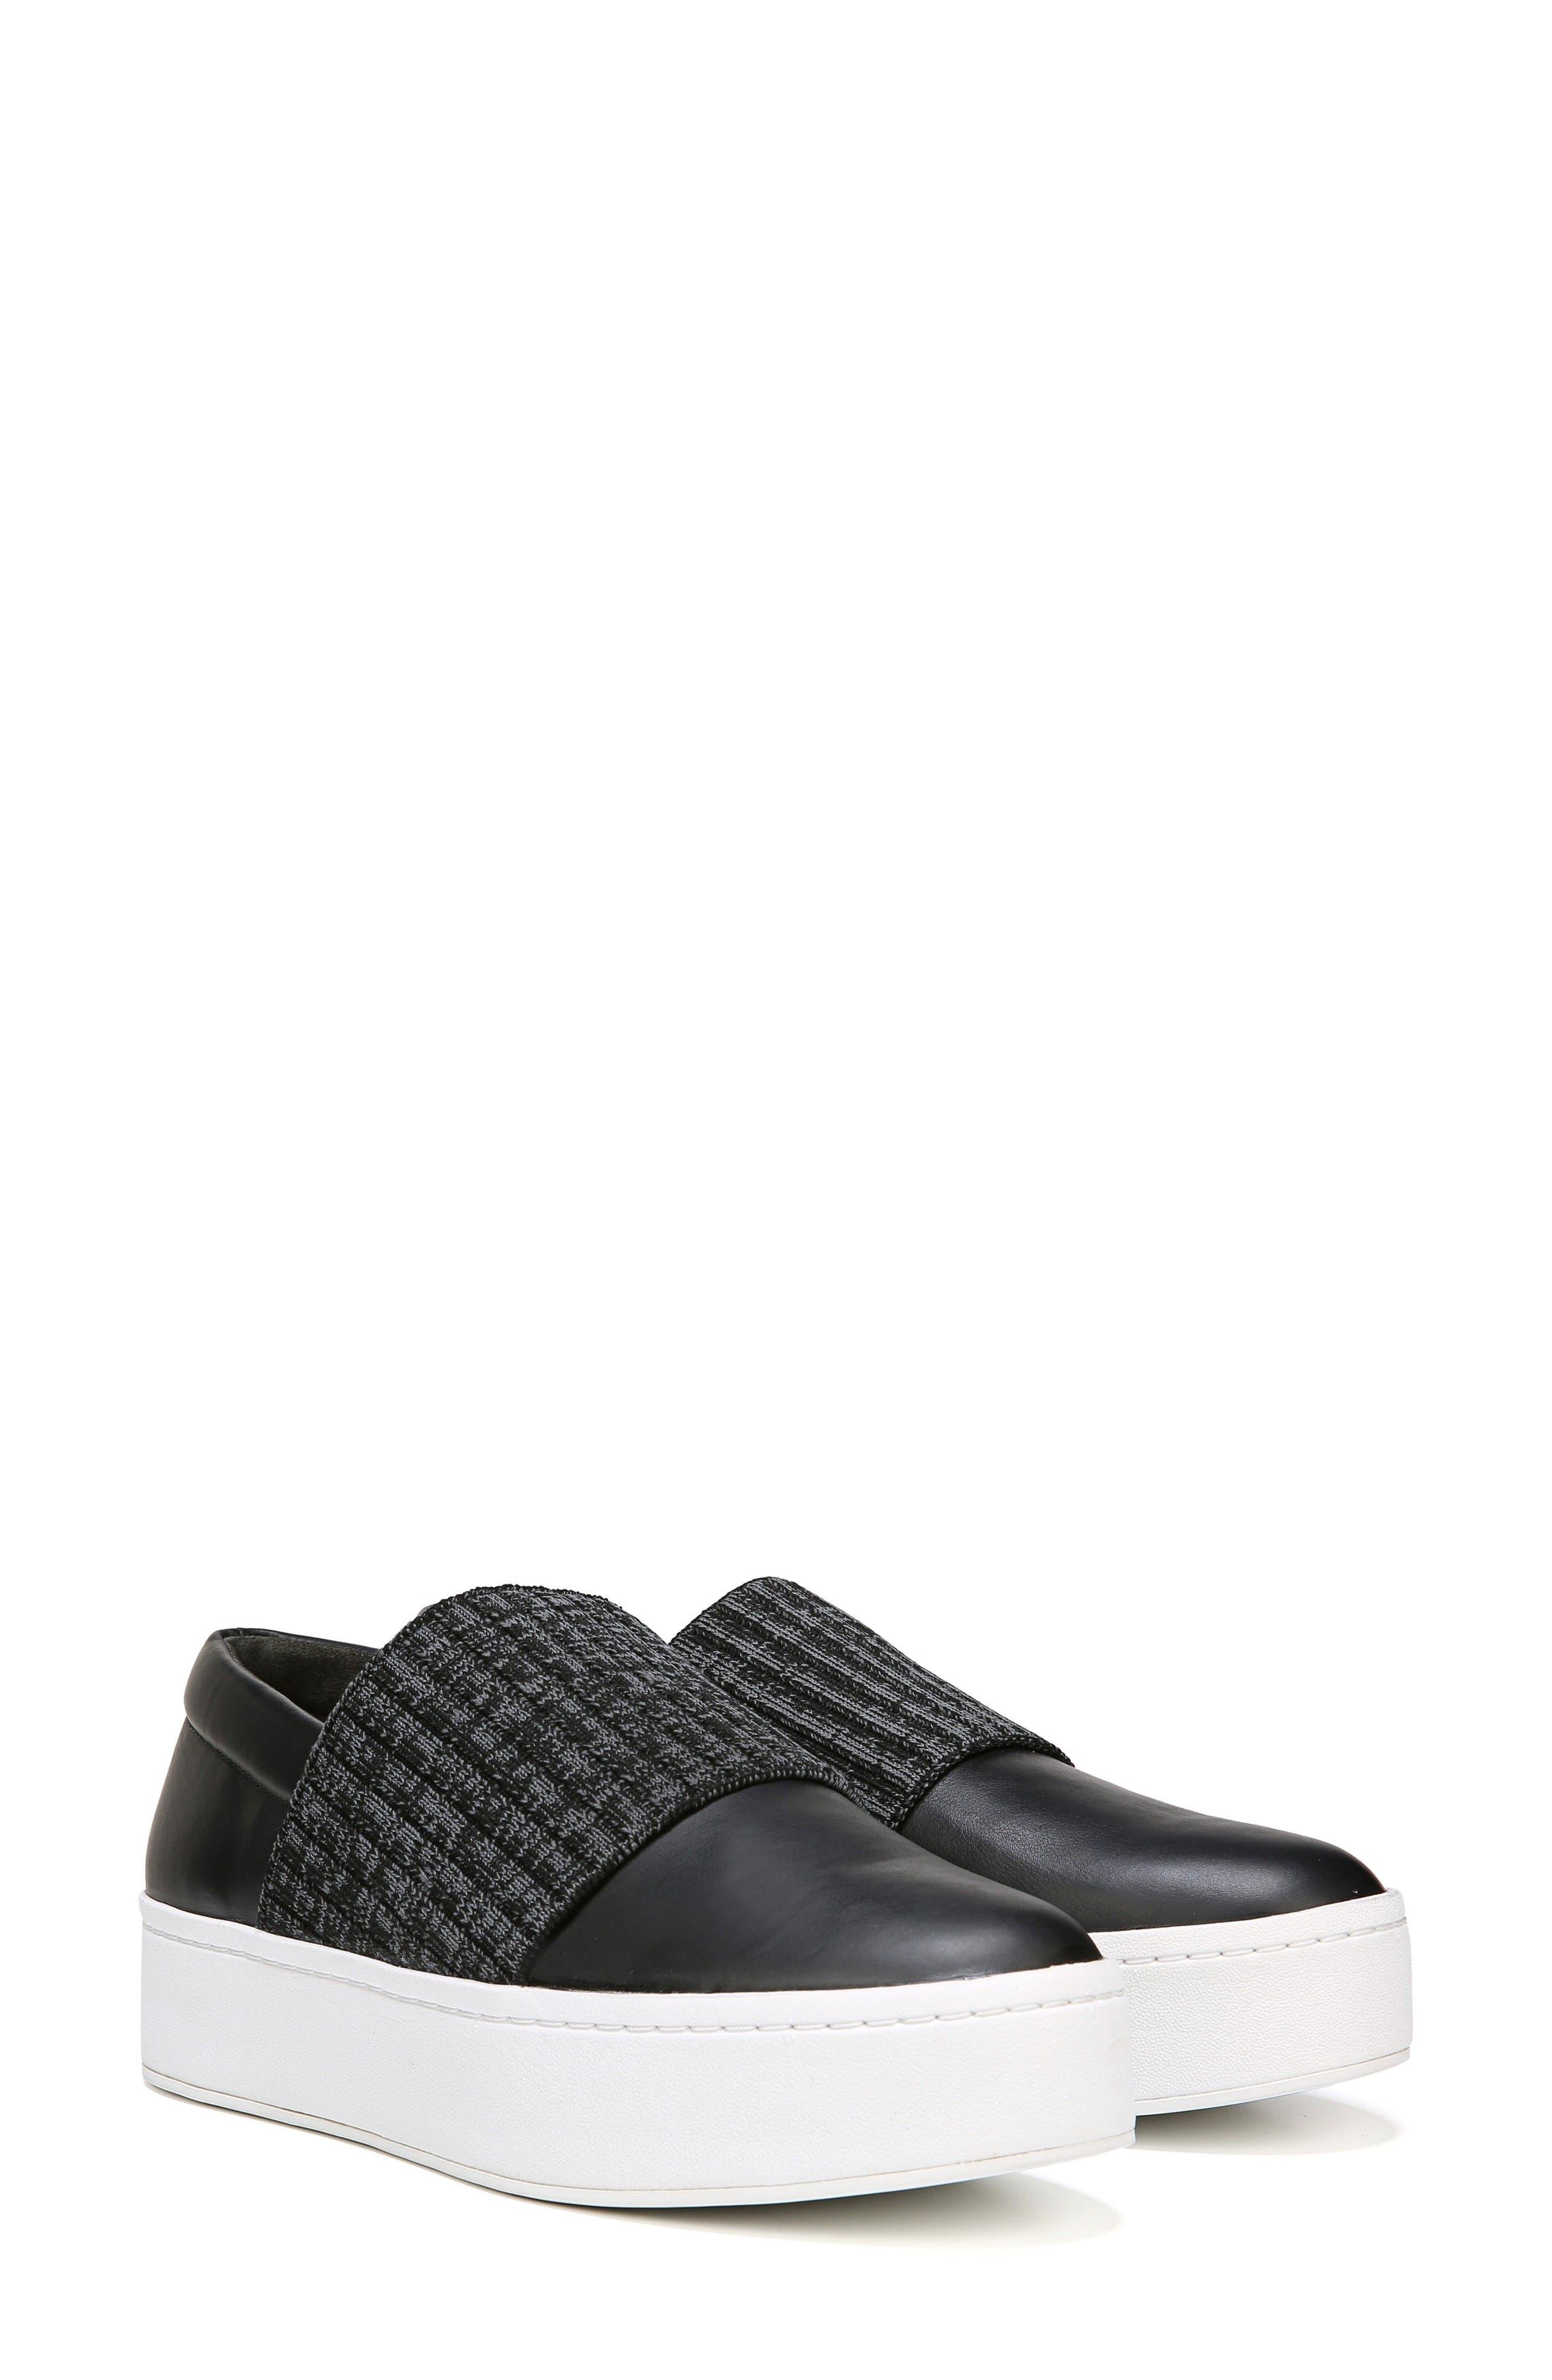 Weadon Slip-On Sneaker,                             Alternate thumbnail 7, color,                             Black Siviglia Calf